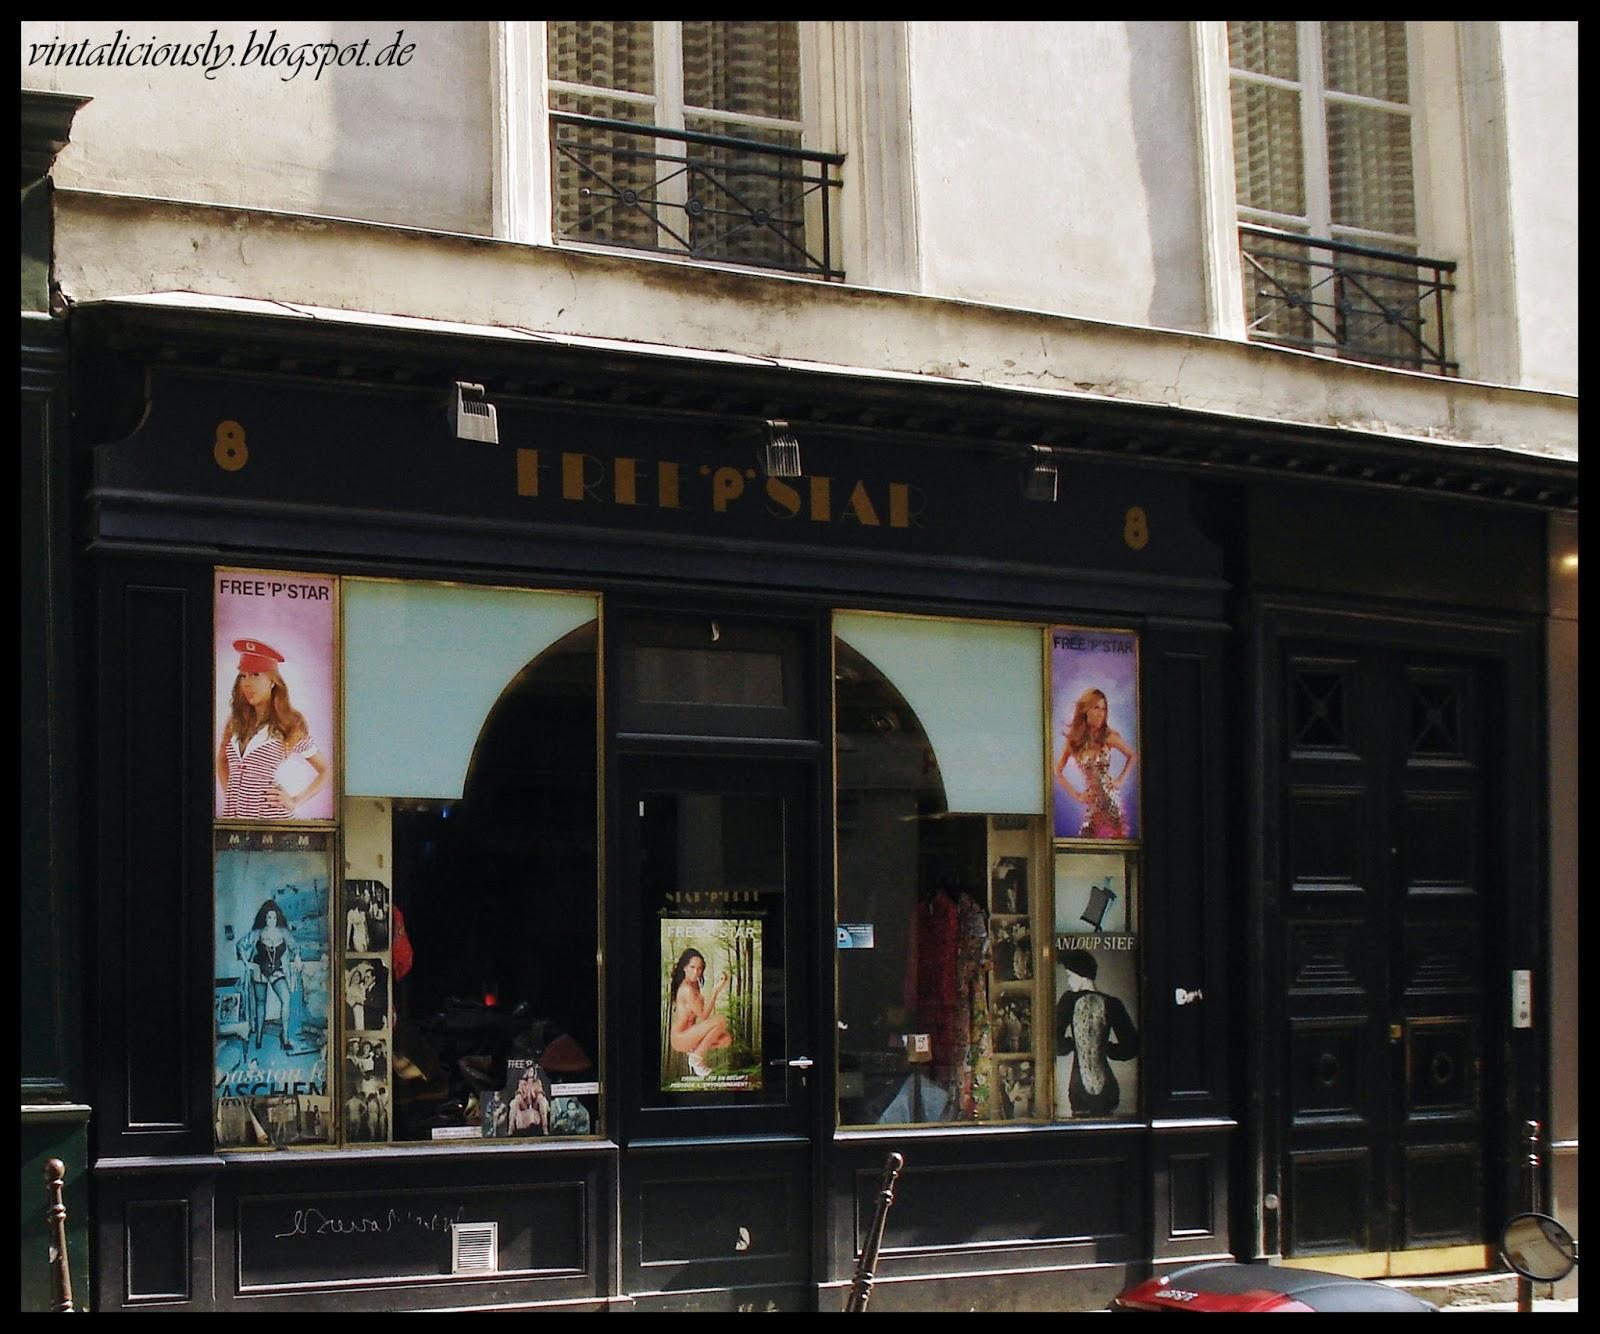 Paris freepstar vintaliciously vintage blog for Retro shop paris